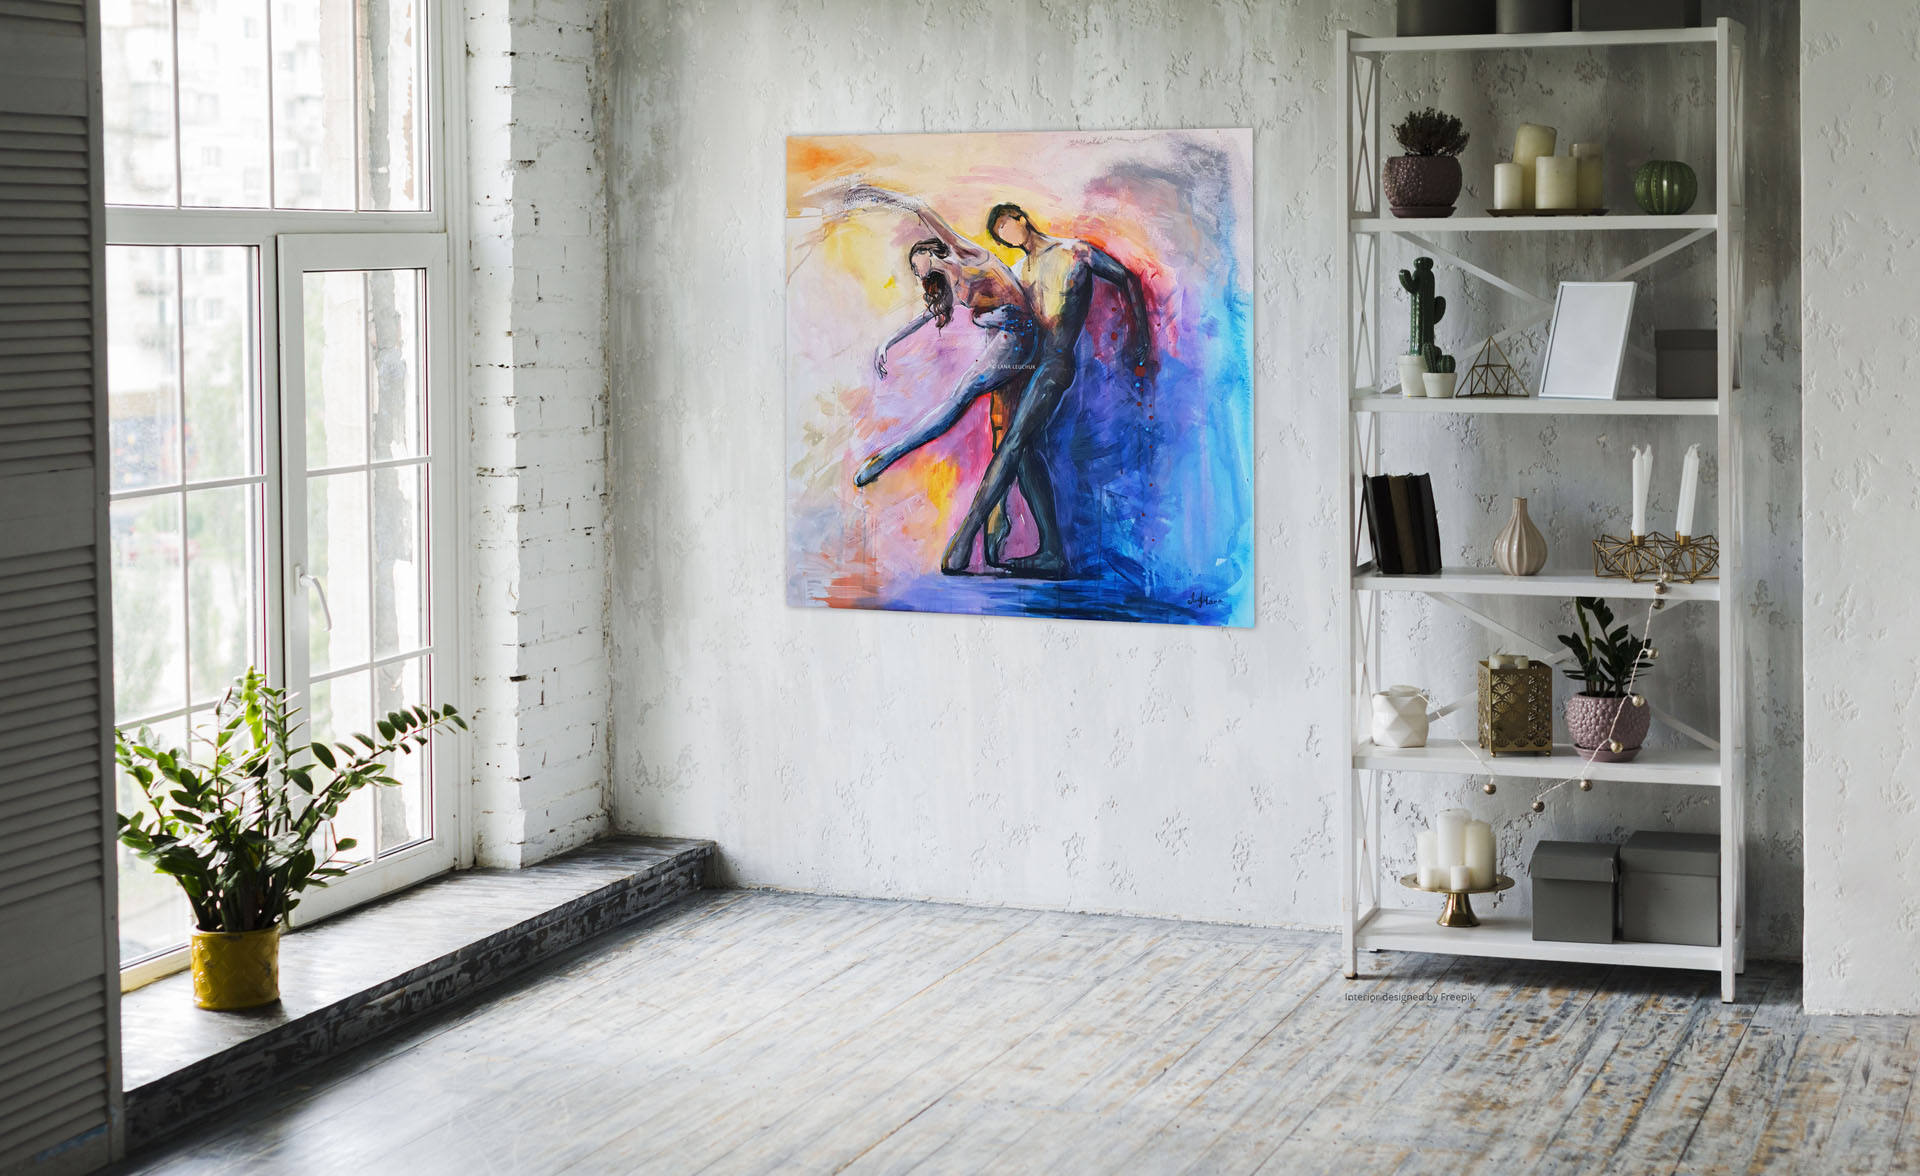 artwork-in-interior-Dancing with a stranger-by-Lana Leuchuk-sm